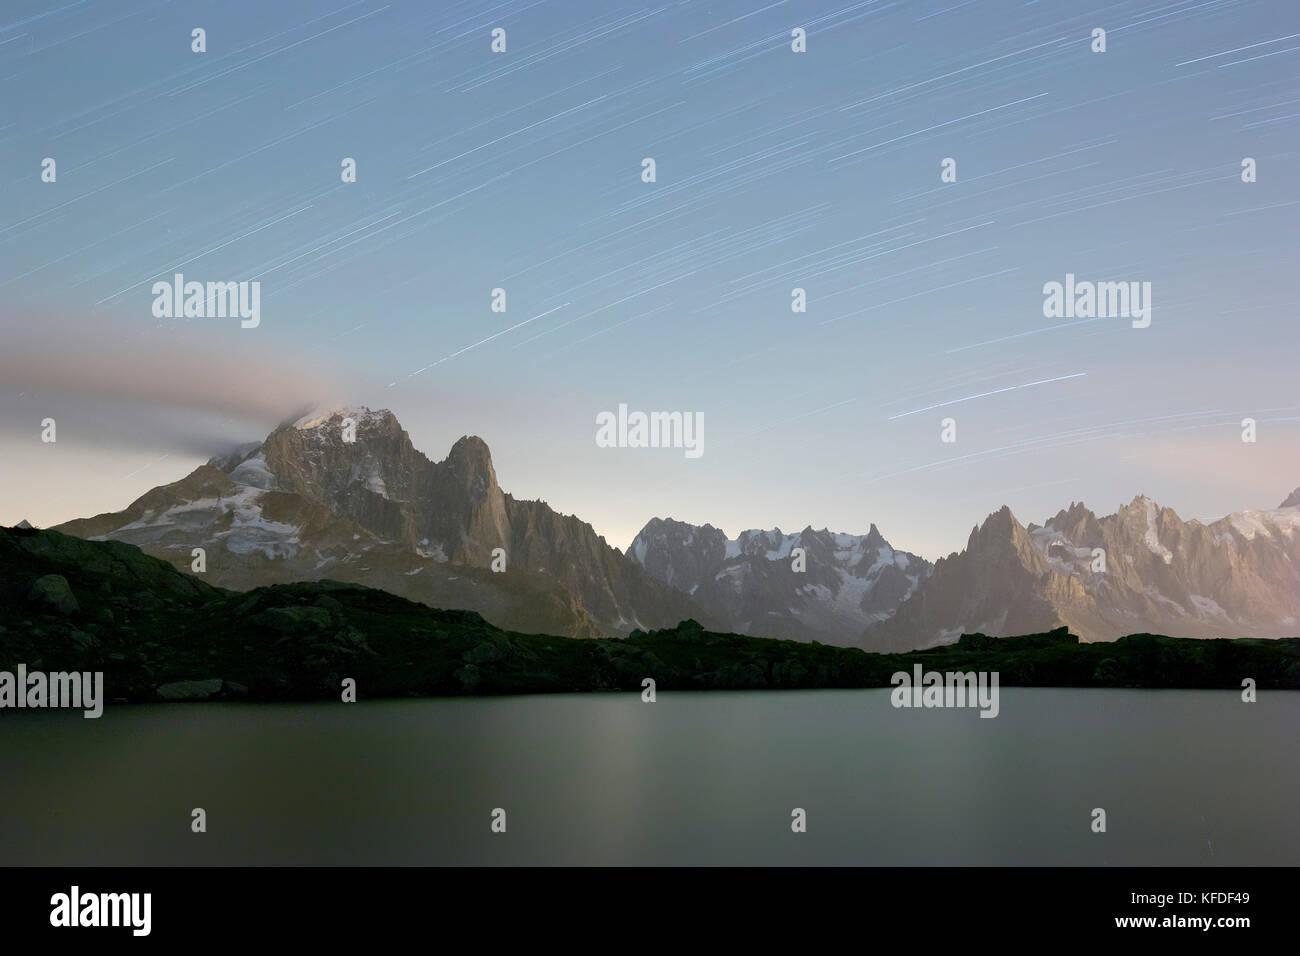 Star trail on the rocky peaks of Les drus and Aiguille Verte, Lacs De Cheserys, Chamonix, Haute Savoie, France Stock Photo